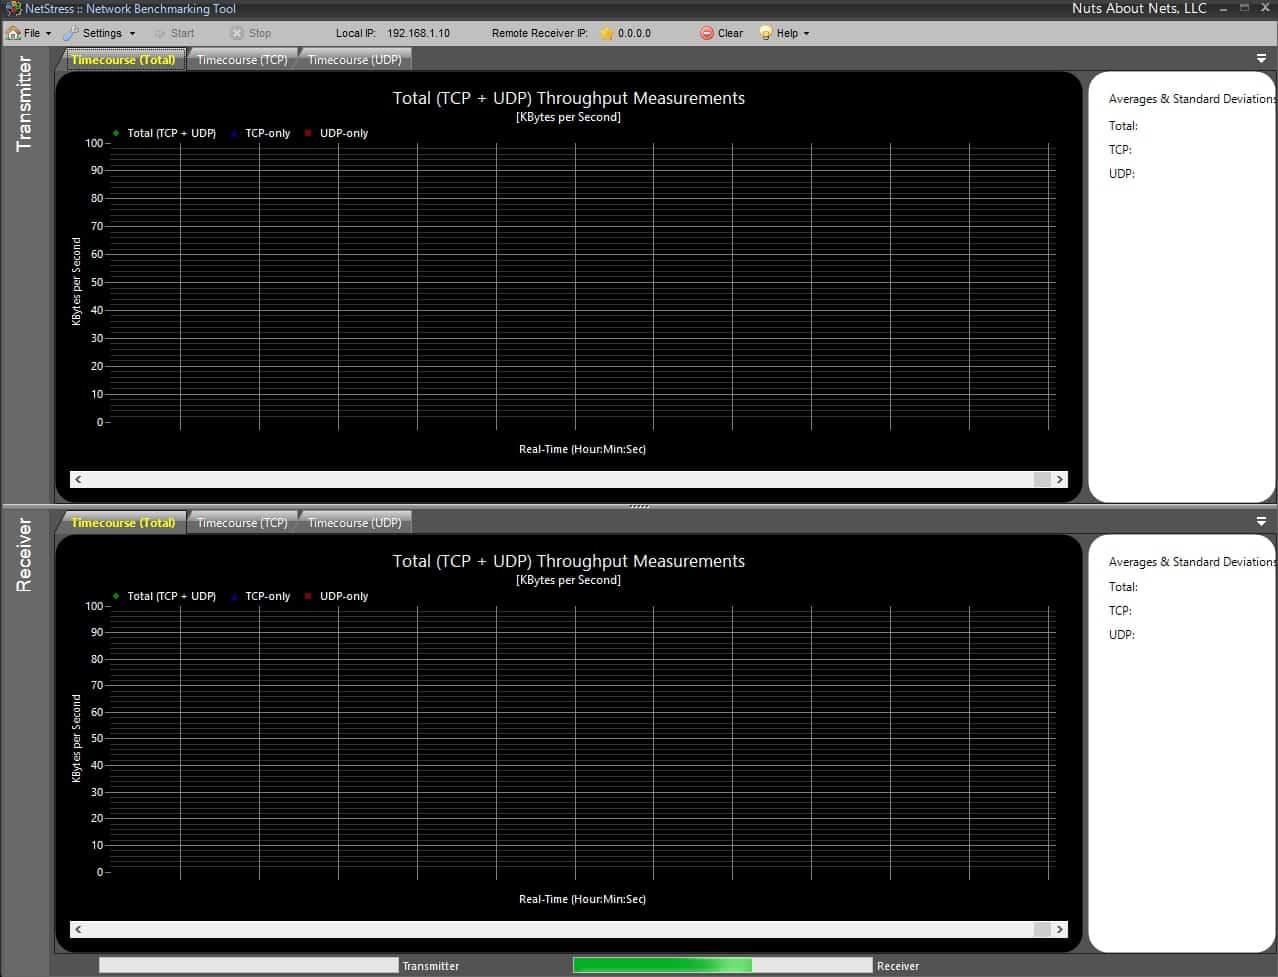 Network Benchmarking NetStress